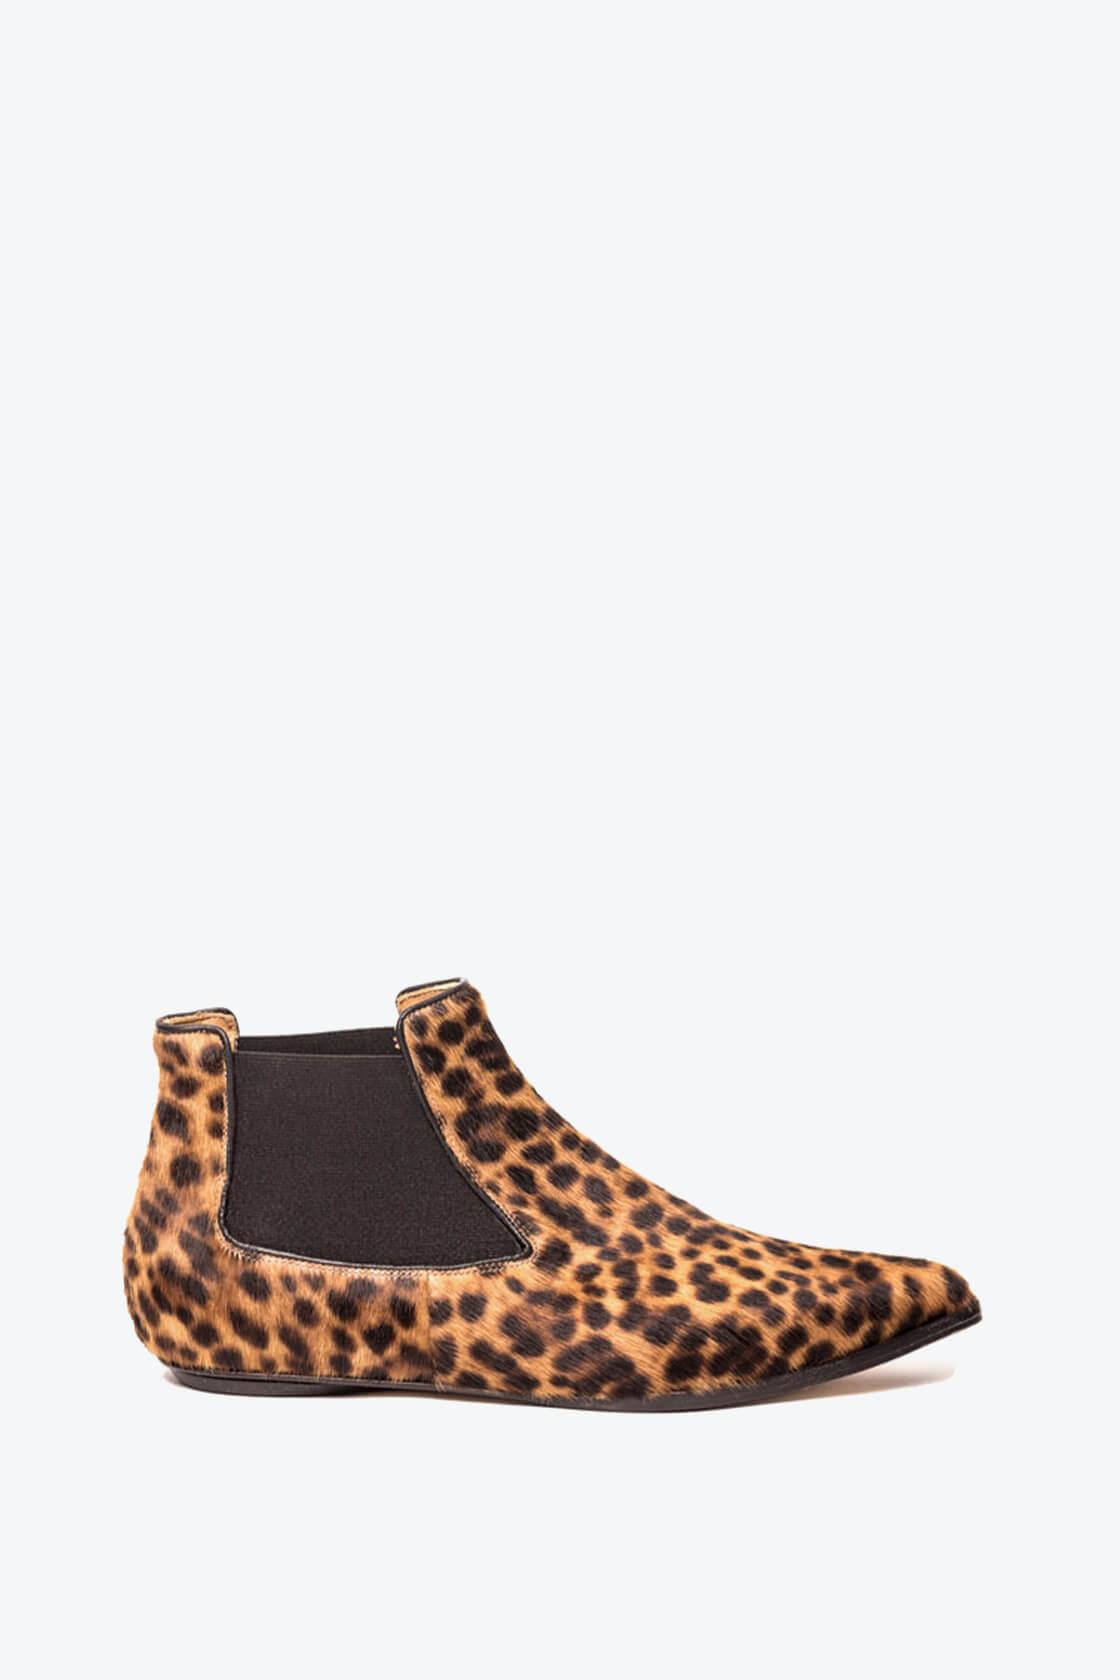 EJK0000049 Niki chelsea boots Leopard print 1